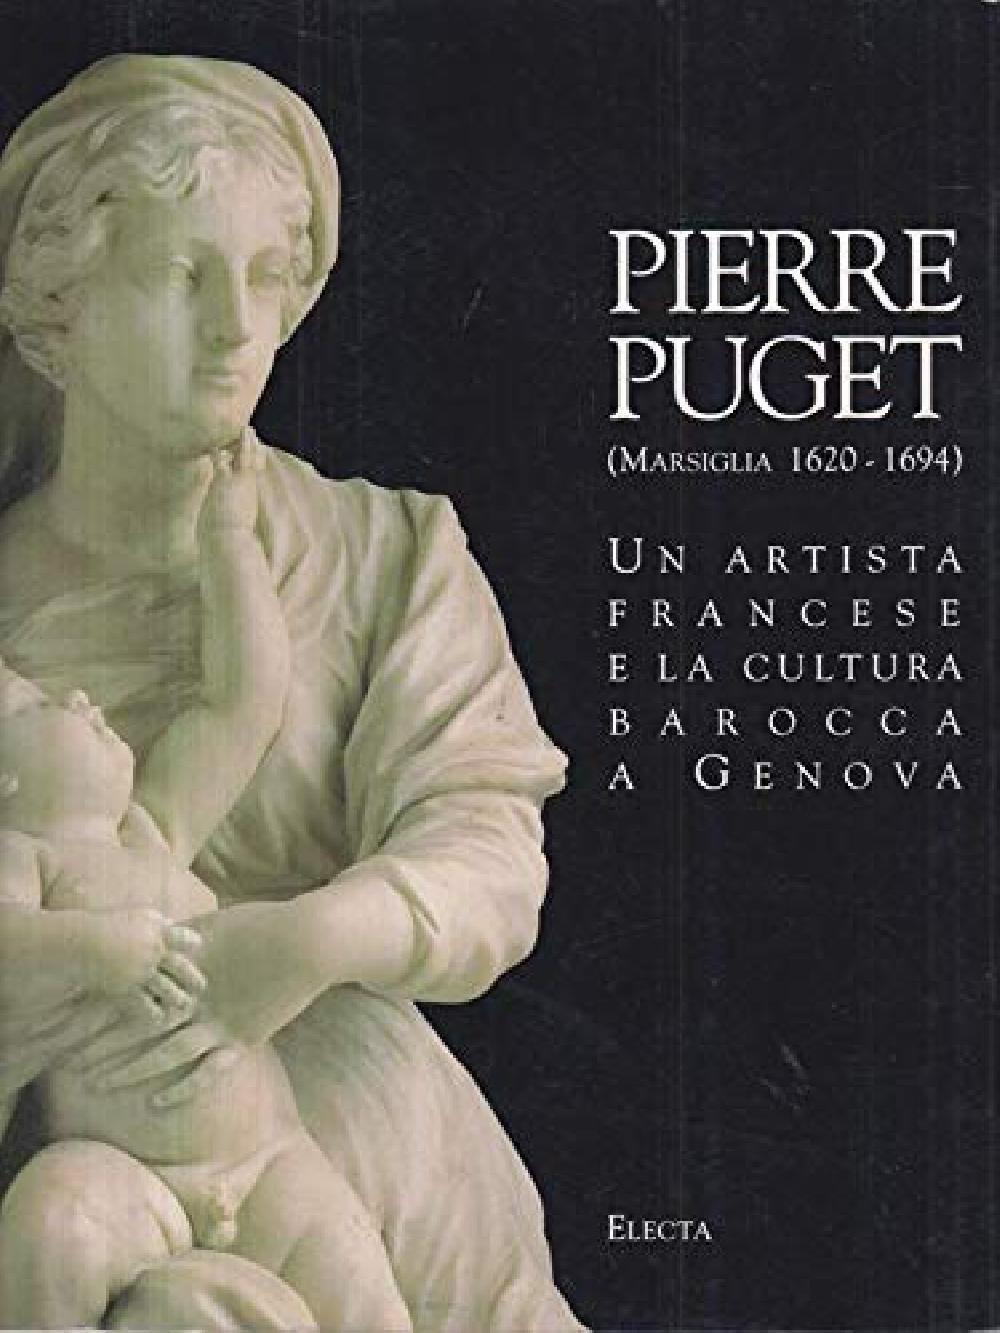 Pierre Puget, un artista francese e la cultura barocca a genova